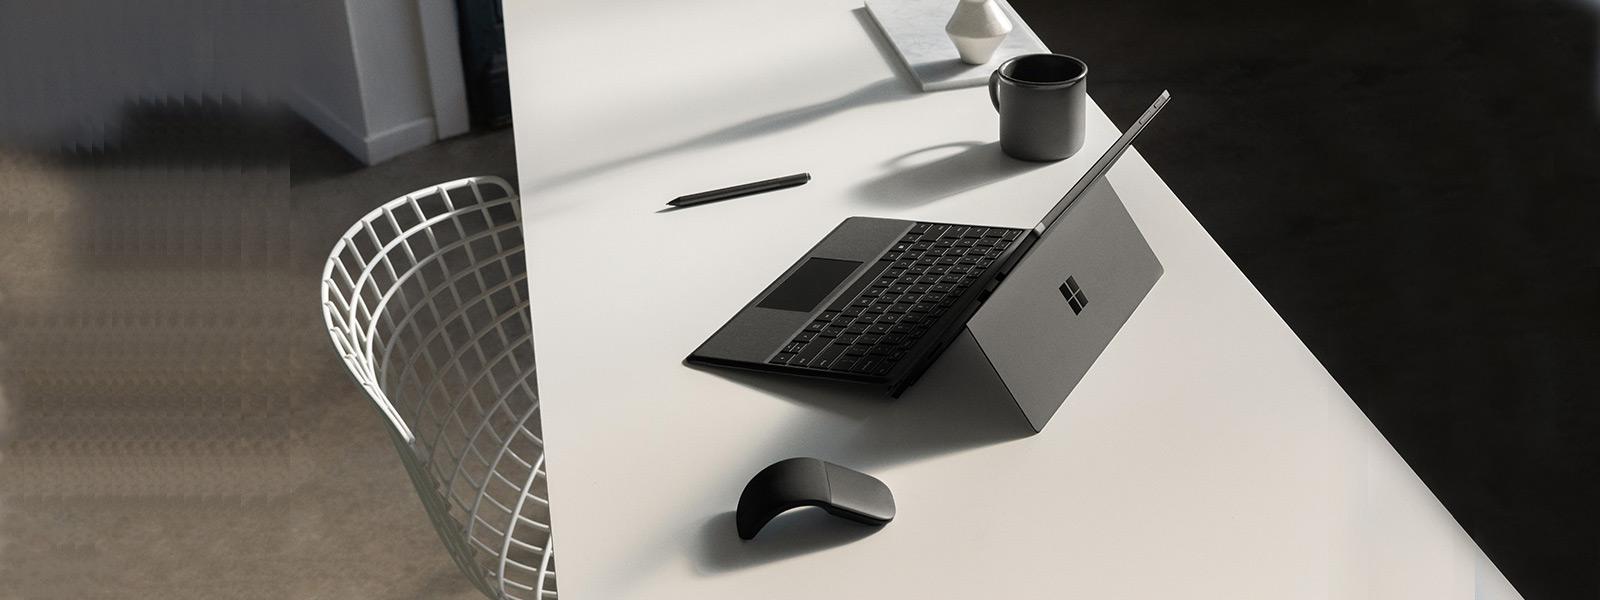 Surface Pro 6 sobre un escritorio en modo de portátil con Funda con teclado para Surface Pro, Lápiz para Surface y Surface Arc Mouse.